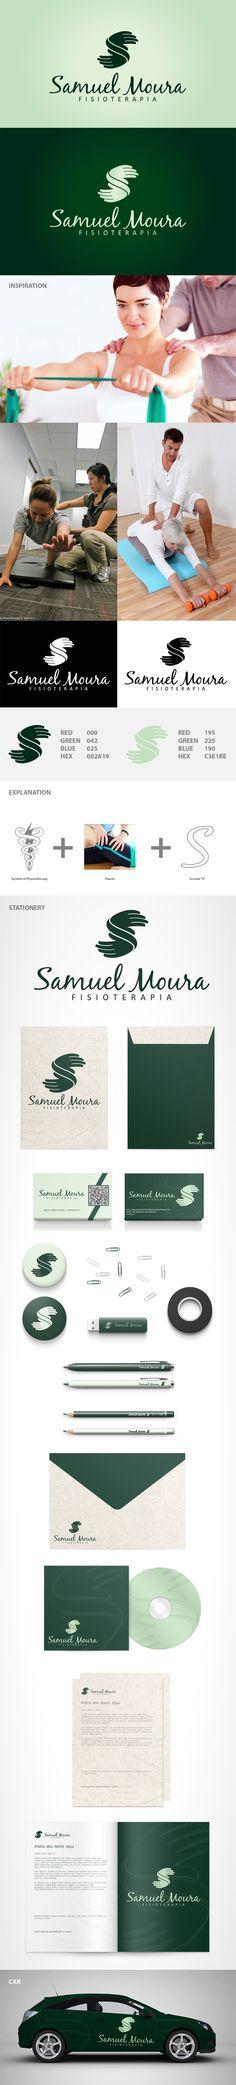 Logotipo Samuel Moura Fisioterapia by Jeymes Kaléo